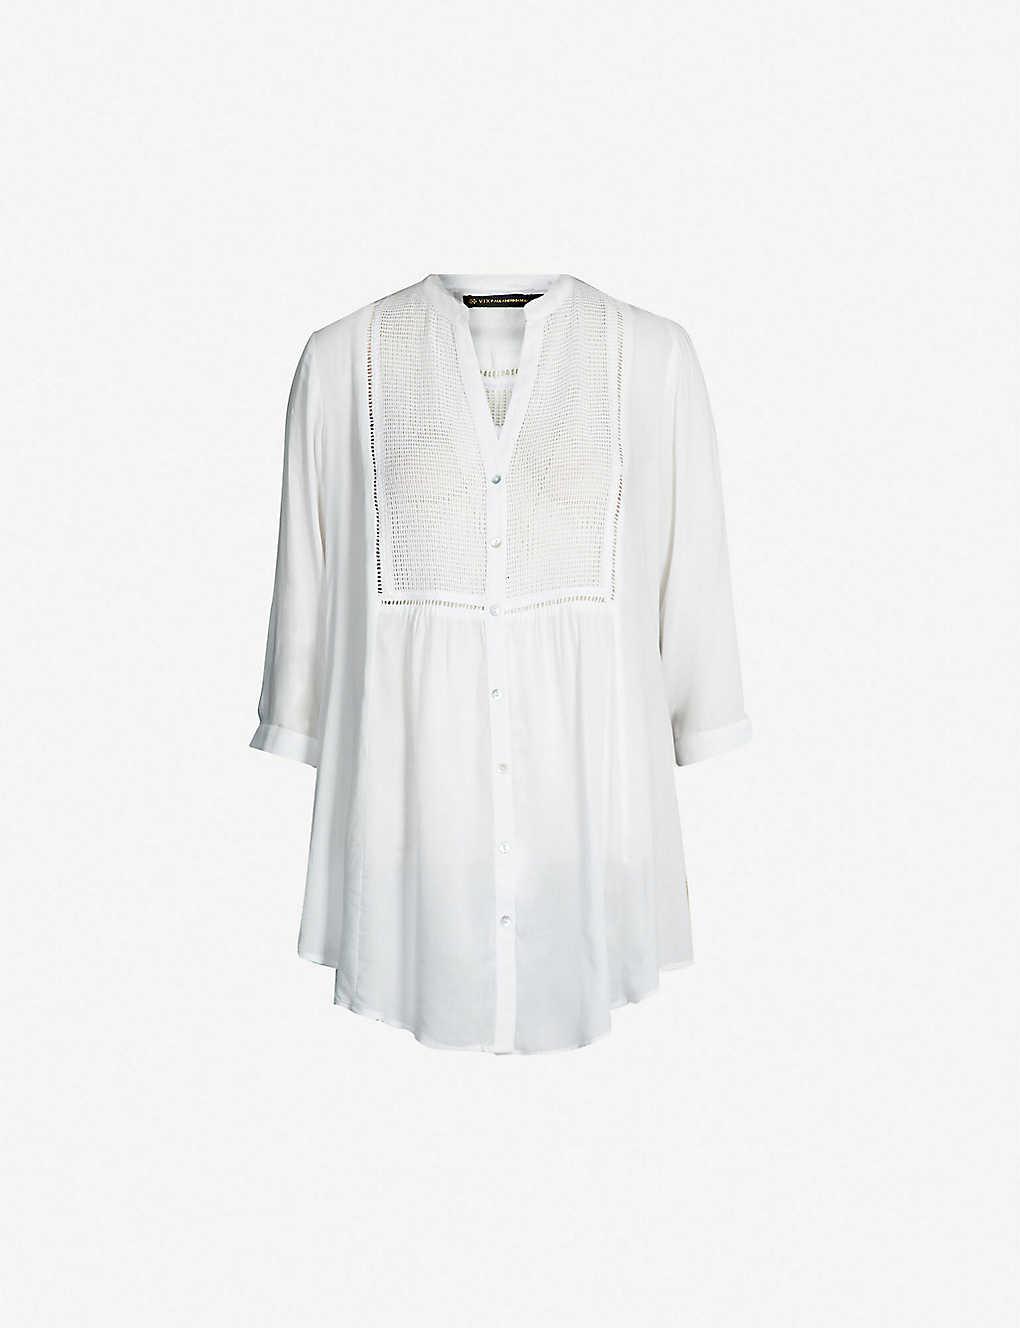 80567062bdf6f Oversized woven shirt zoom; Oversized woven shirt zoom ...